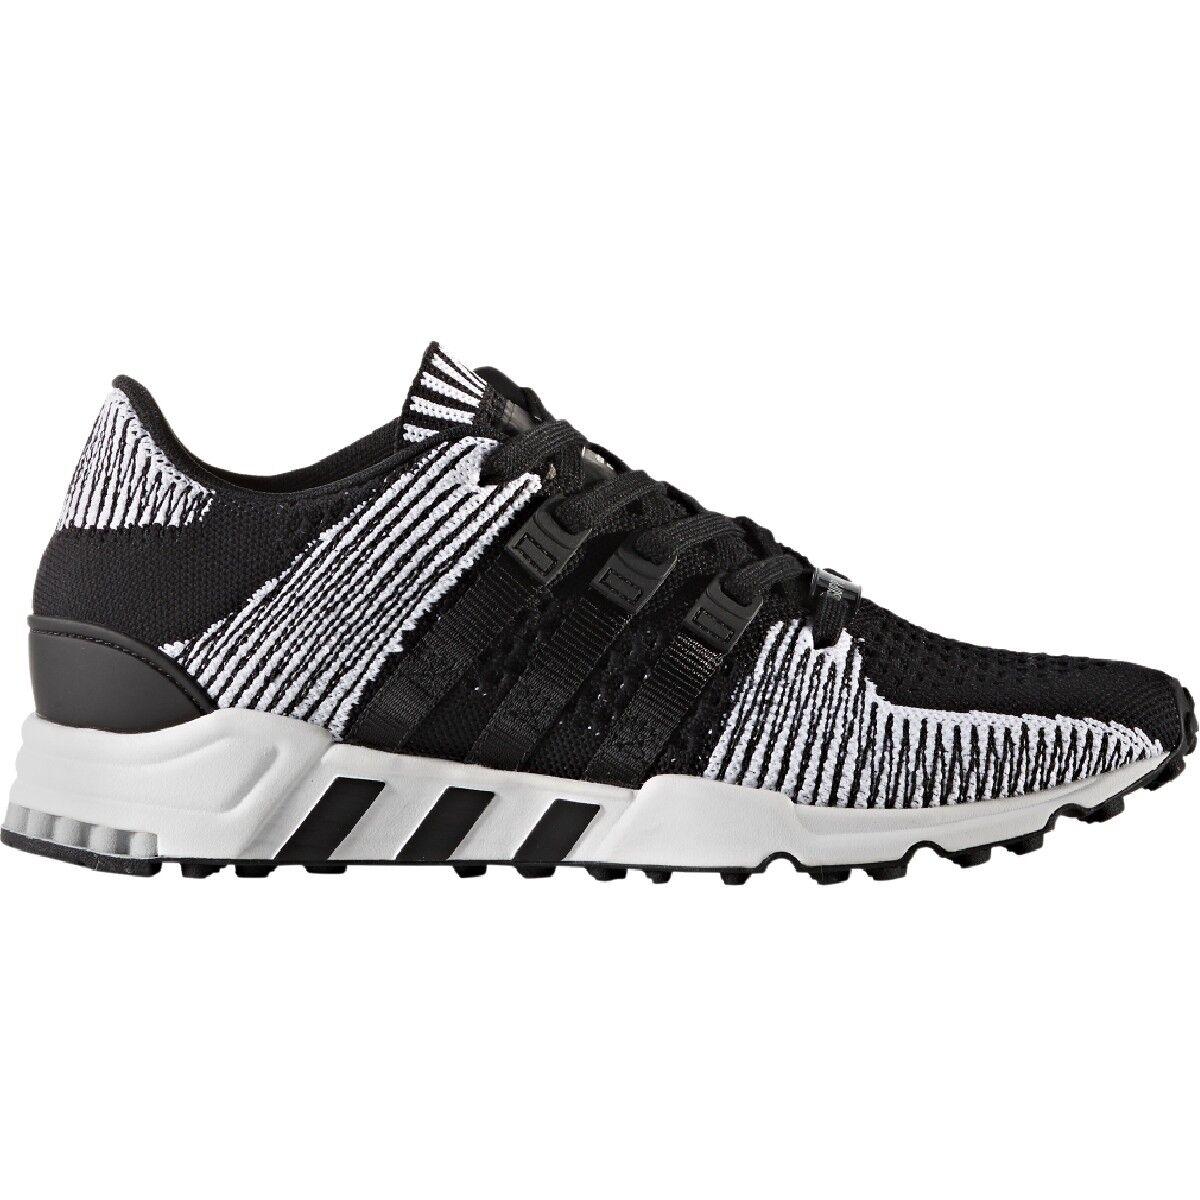 ADIDAS Originals EQUIPMENT SUPPORT RF Primeknit Sneaker Scarpe Da Ginnastica Nero/Bianco | Eccezionale  | Gentiluomo/Signora Scarpa